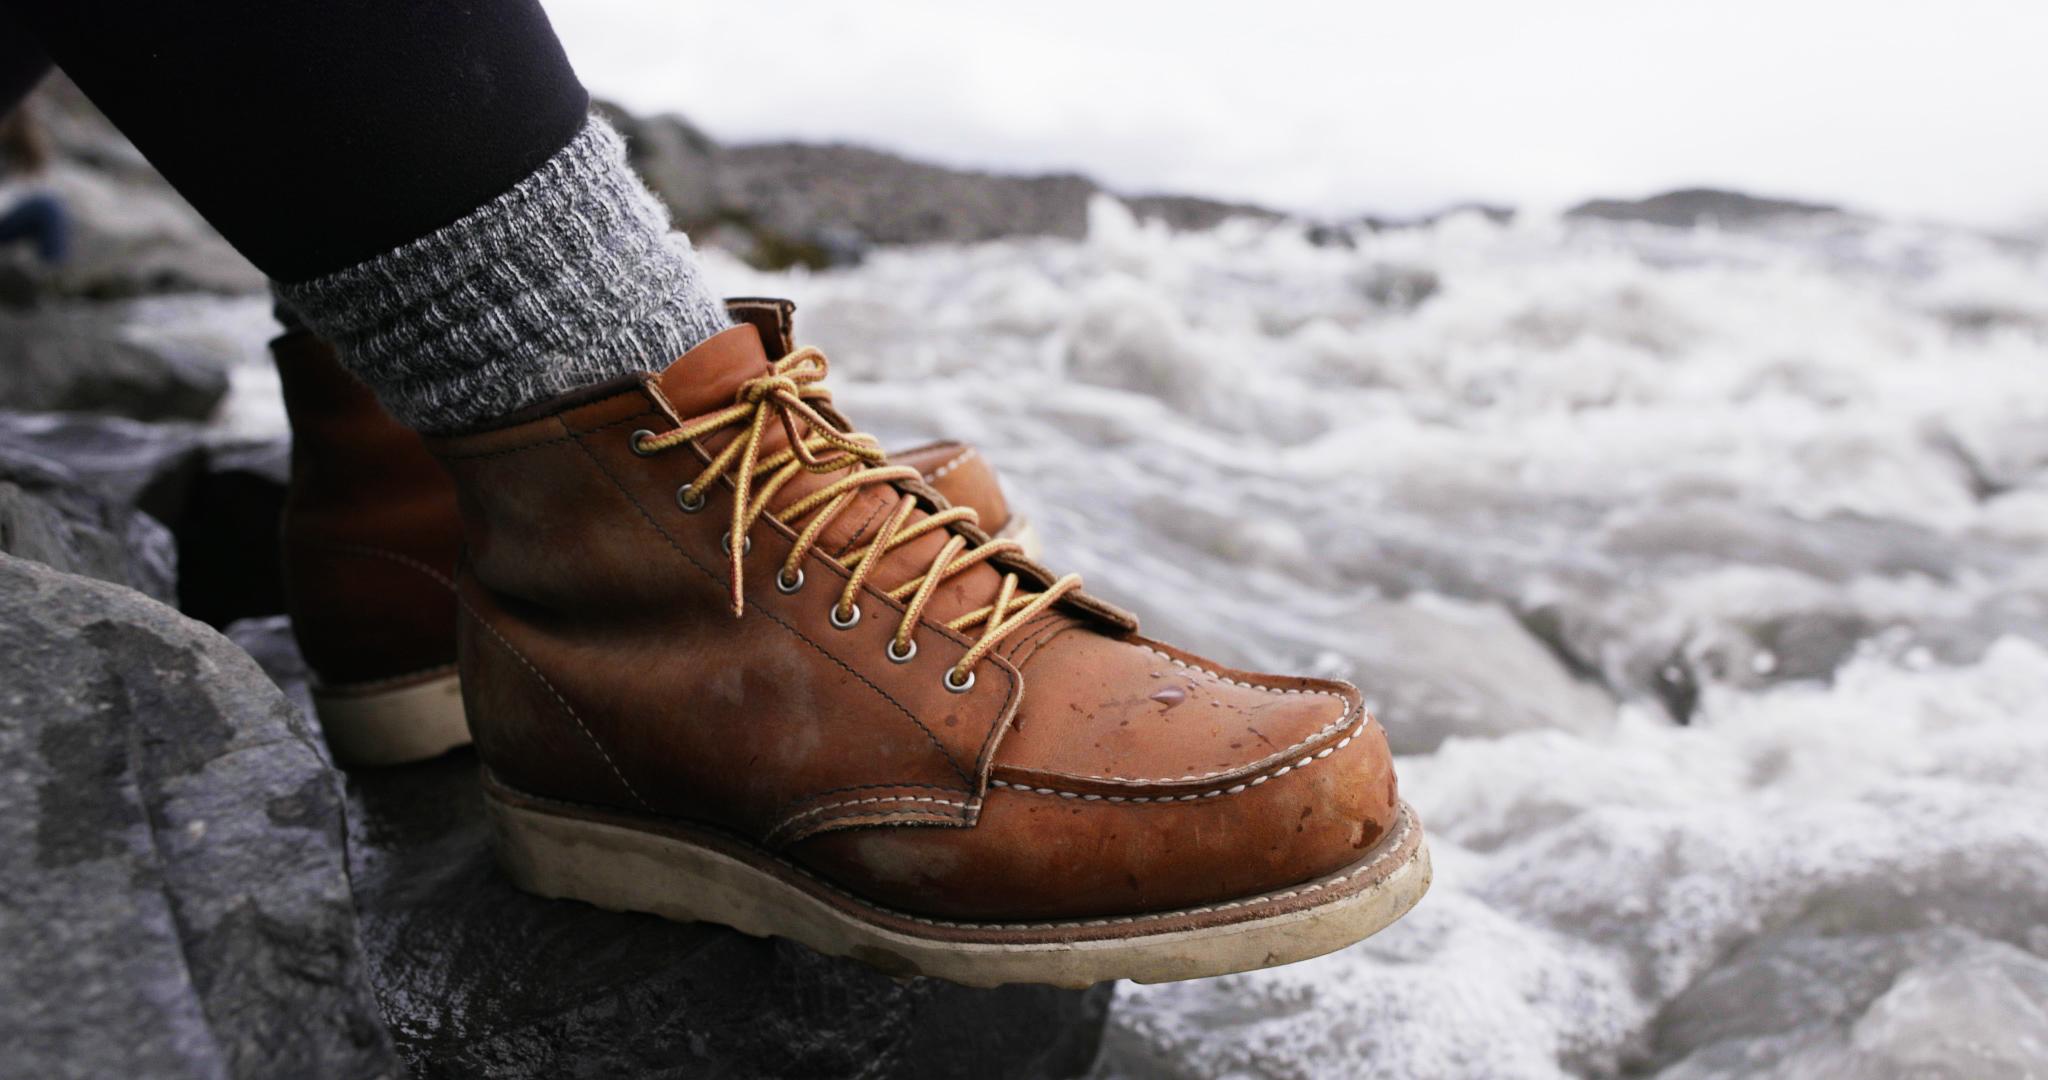 Boots at Detti (Edited).jpg